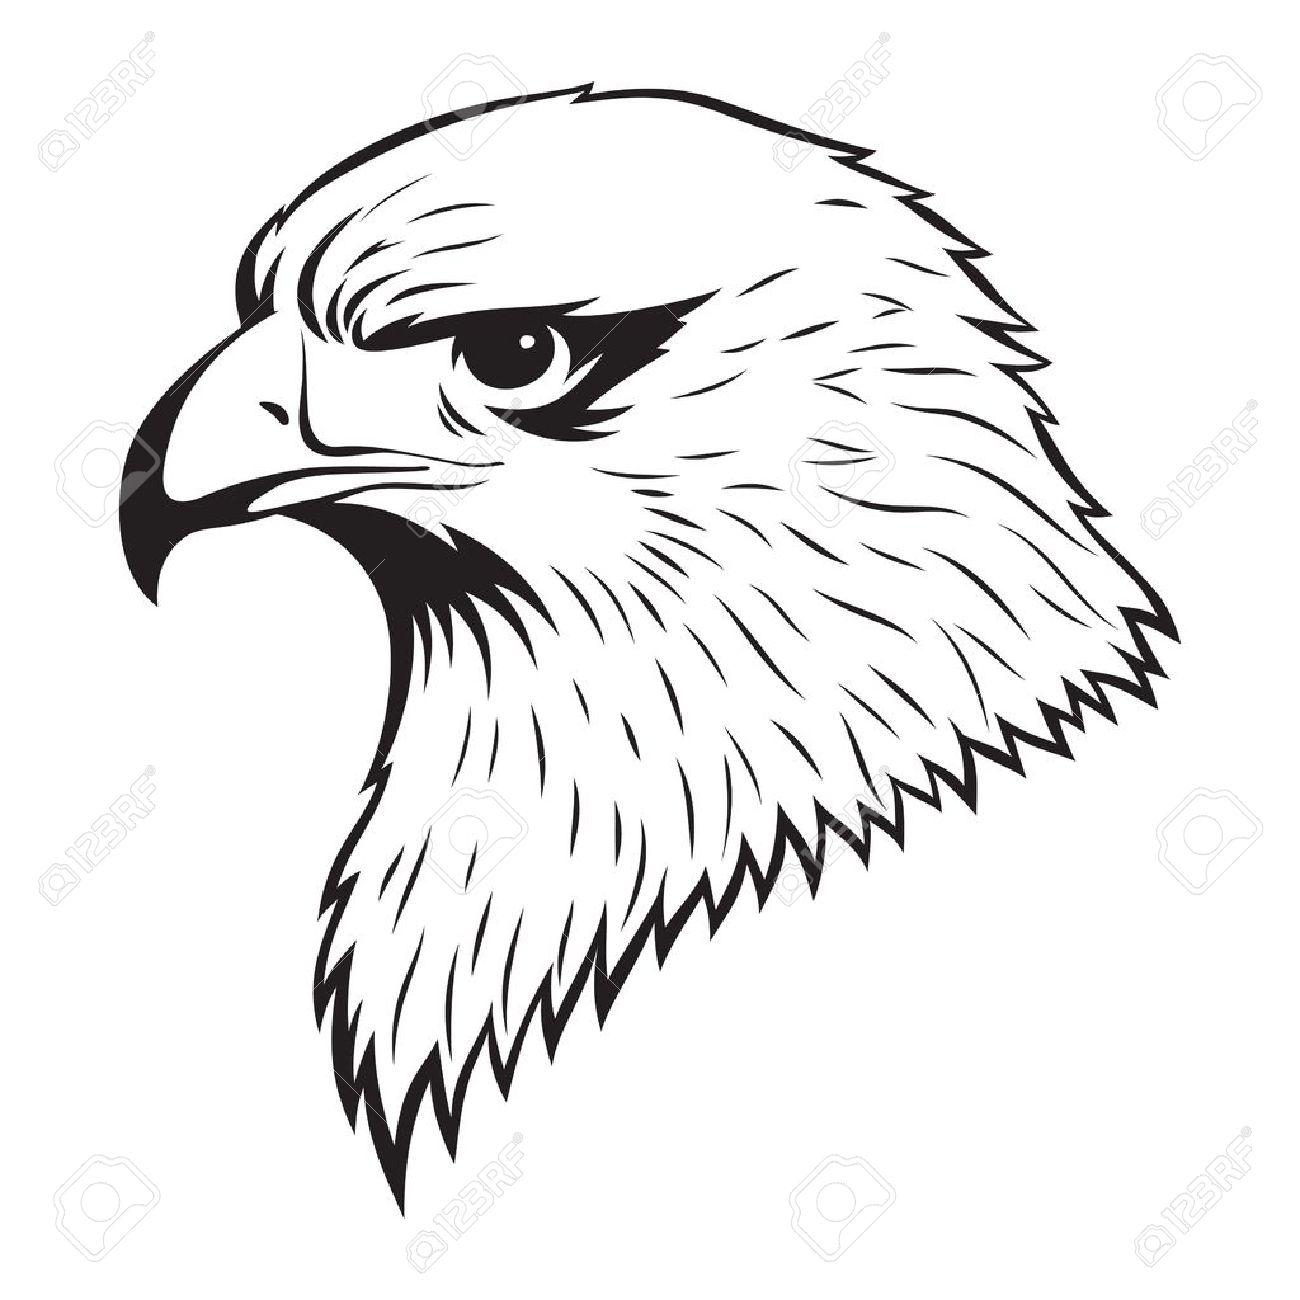 Simple illustration of Eagle head Stock Vector - 18155631